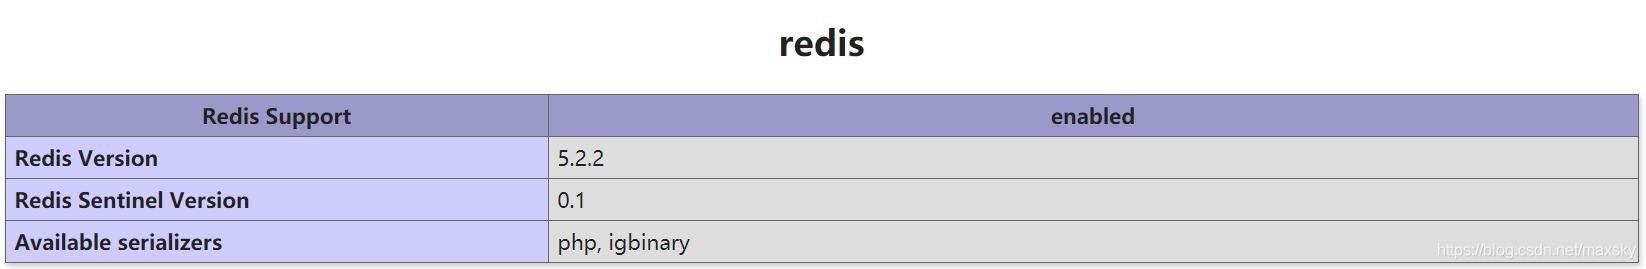 Windows 下编译 PHP Redis 扩展并支持 Igbinary 序列器